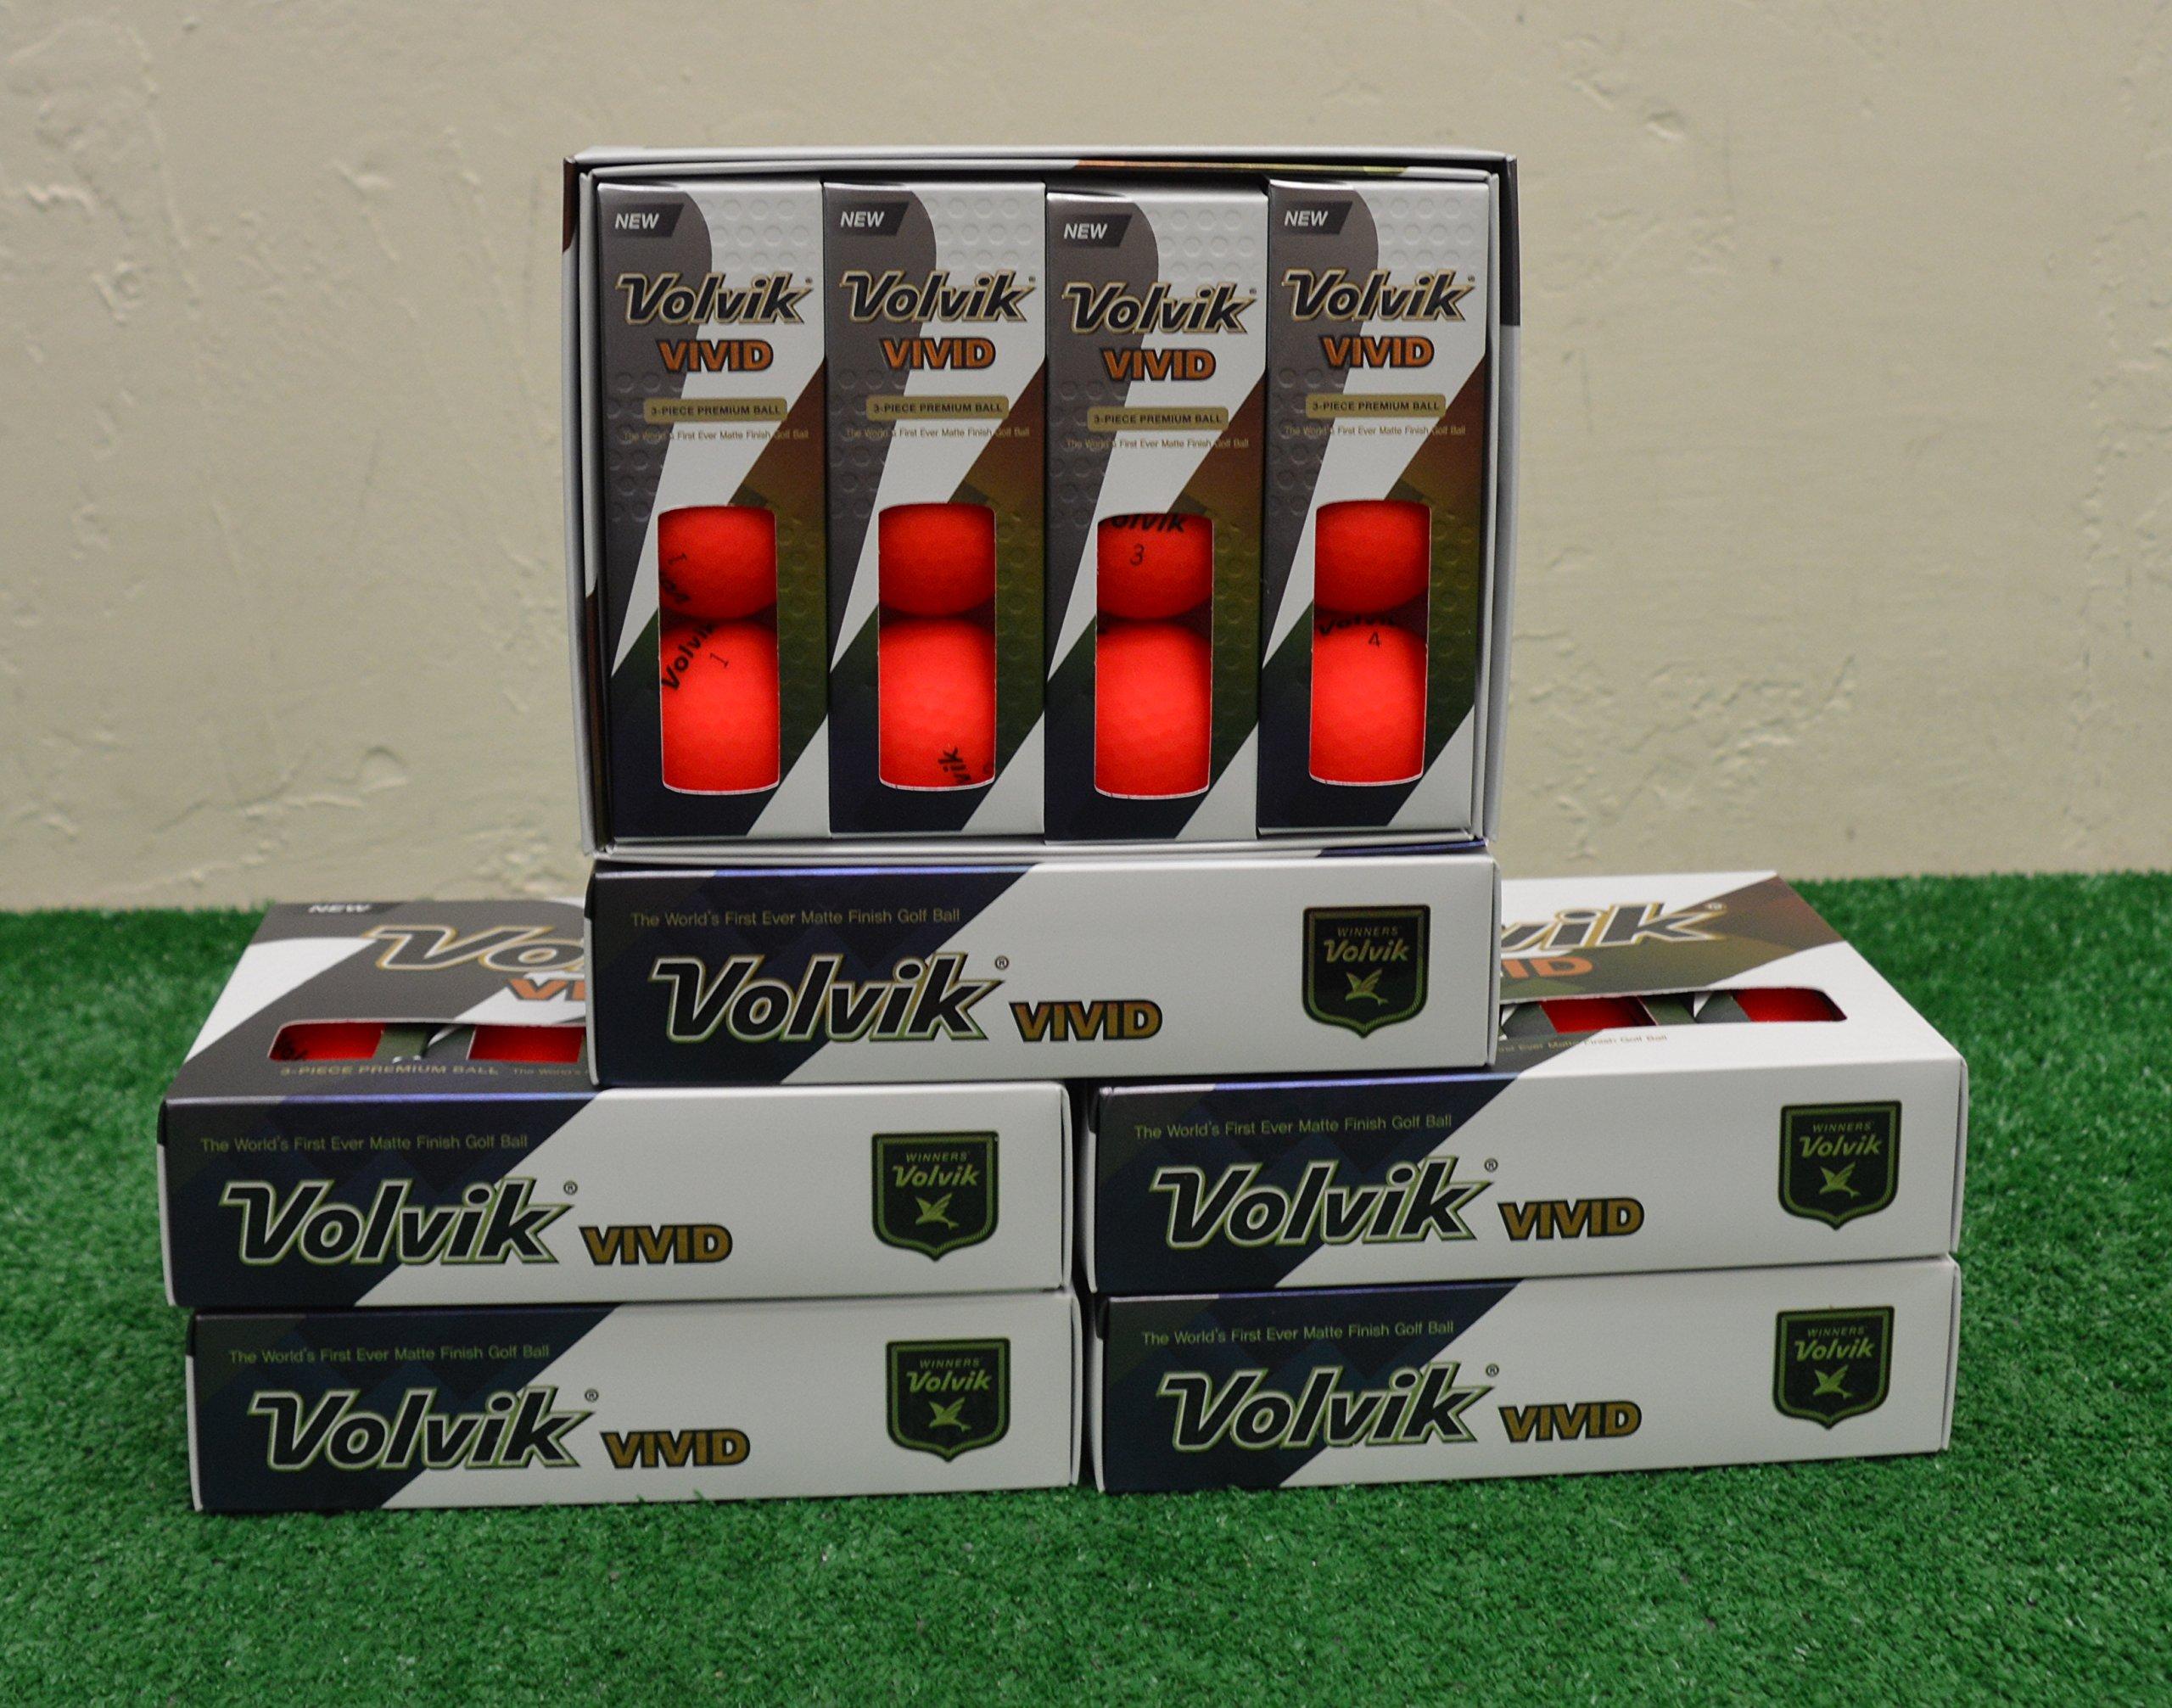 6 Dozen 2018 Volvik Vivid - Matte Red Golf Balls